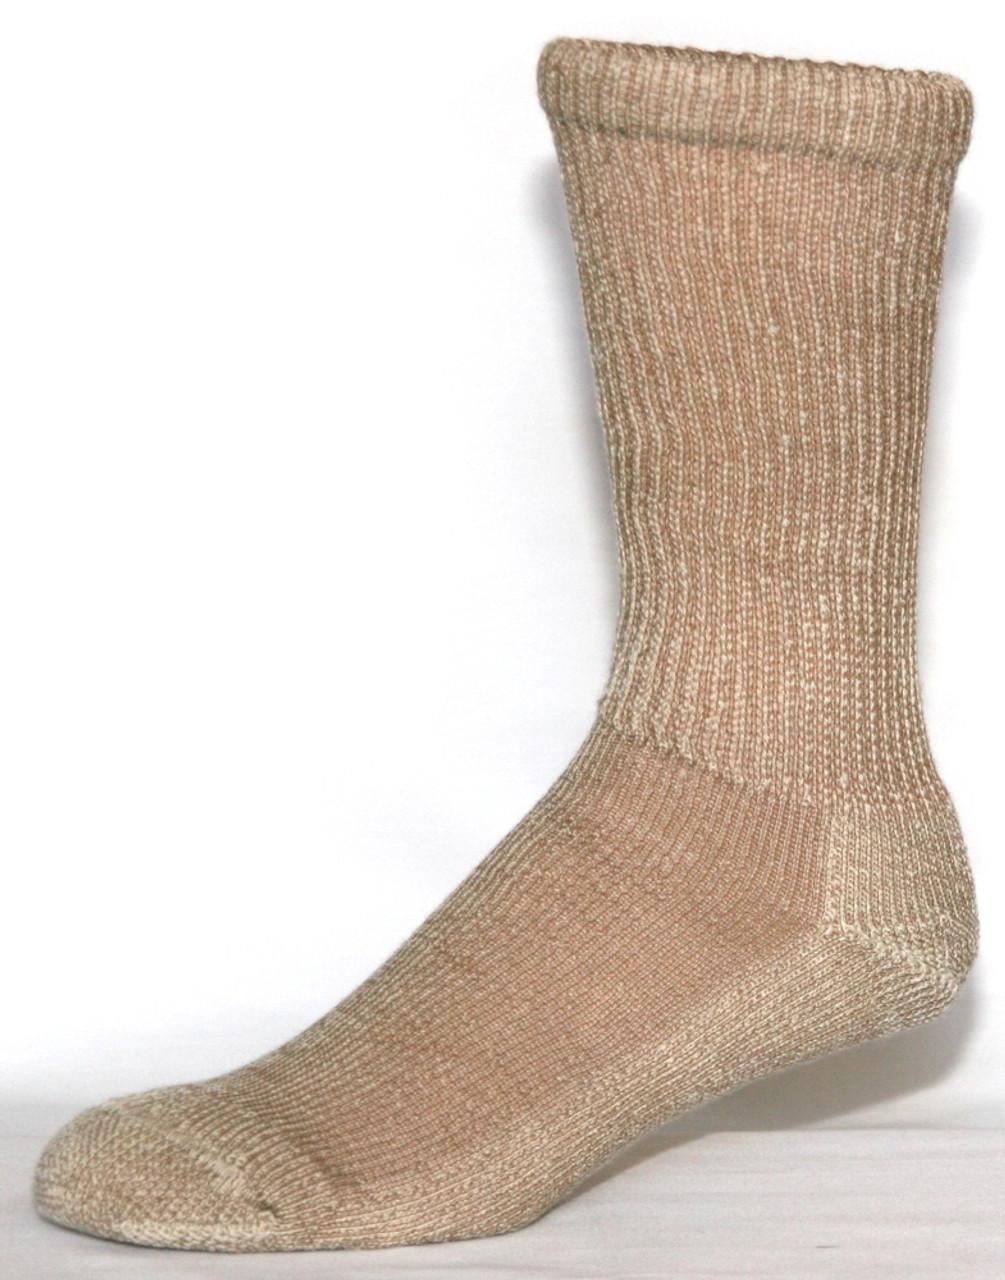 ce61a778d6 Merino Wool Hiking Socks - Motley Woollens Canada - Free Shipping